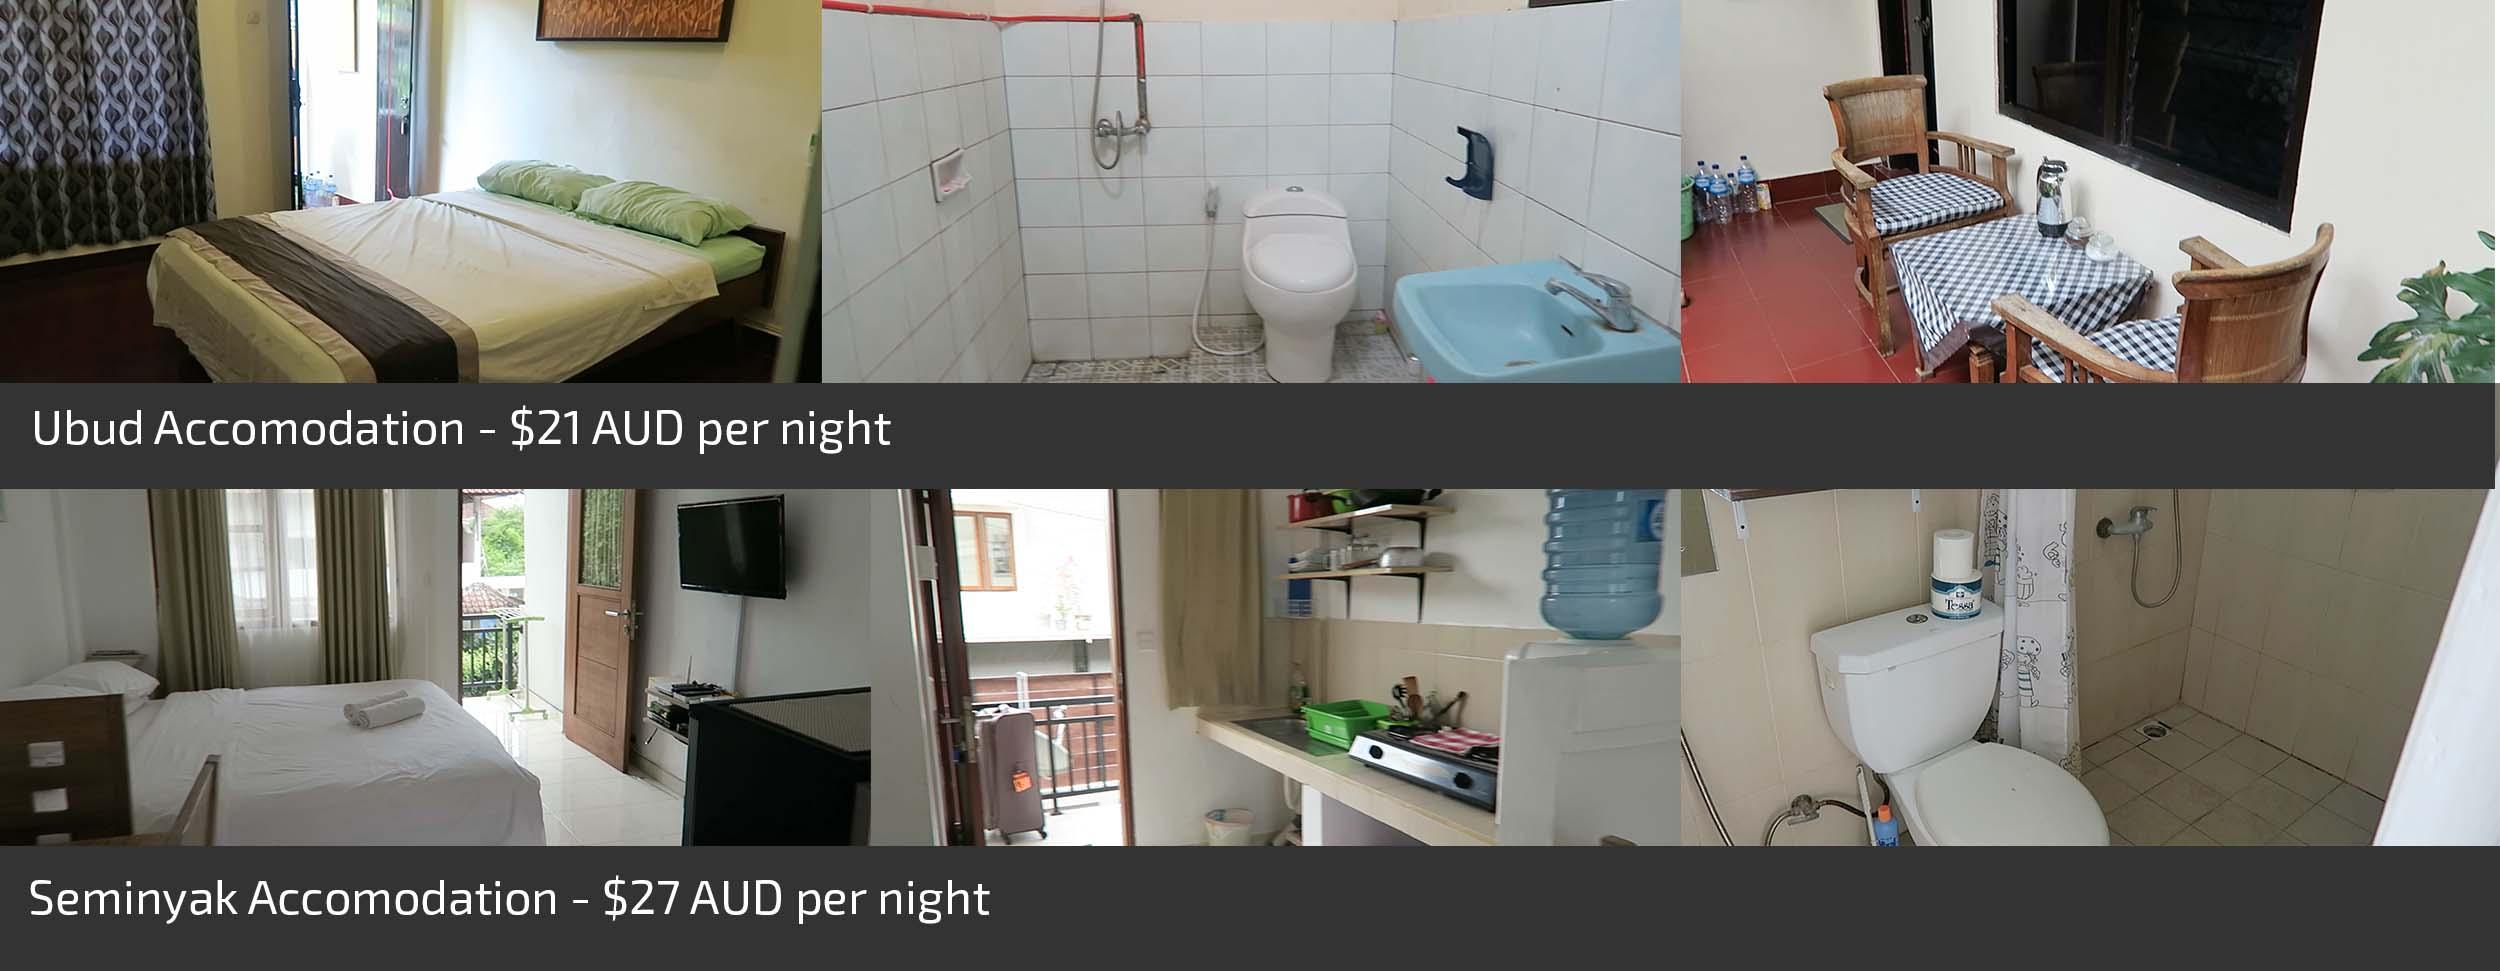 Cheap accommodation in Bali